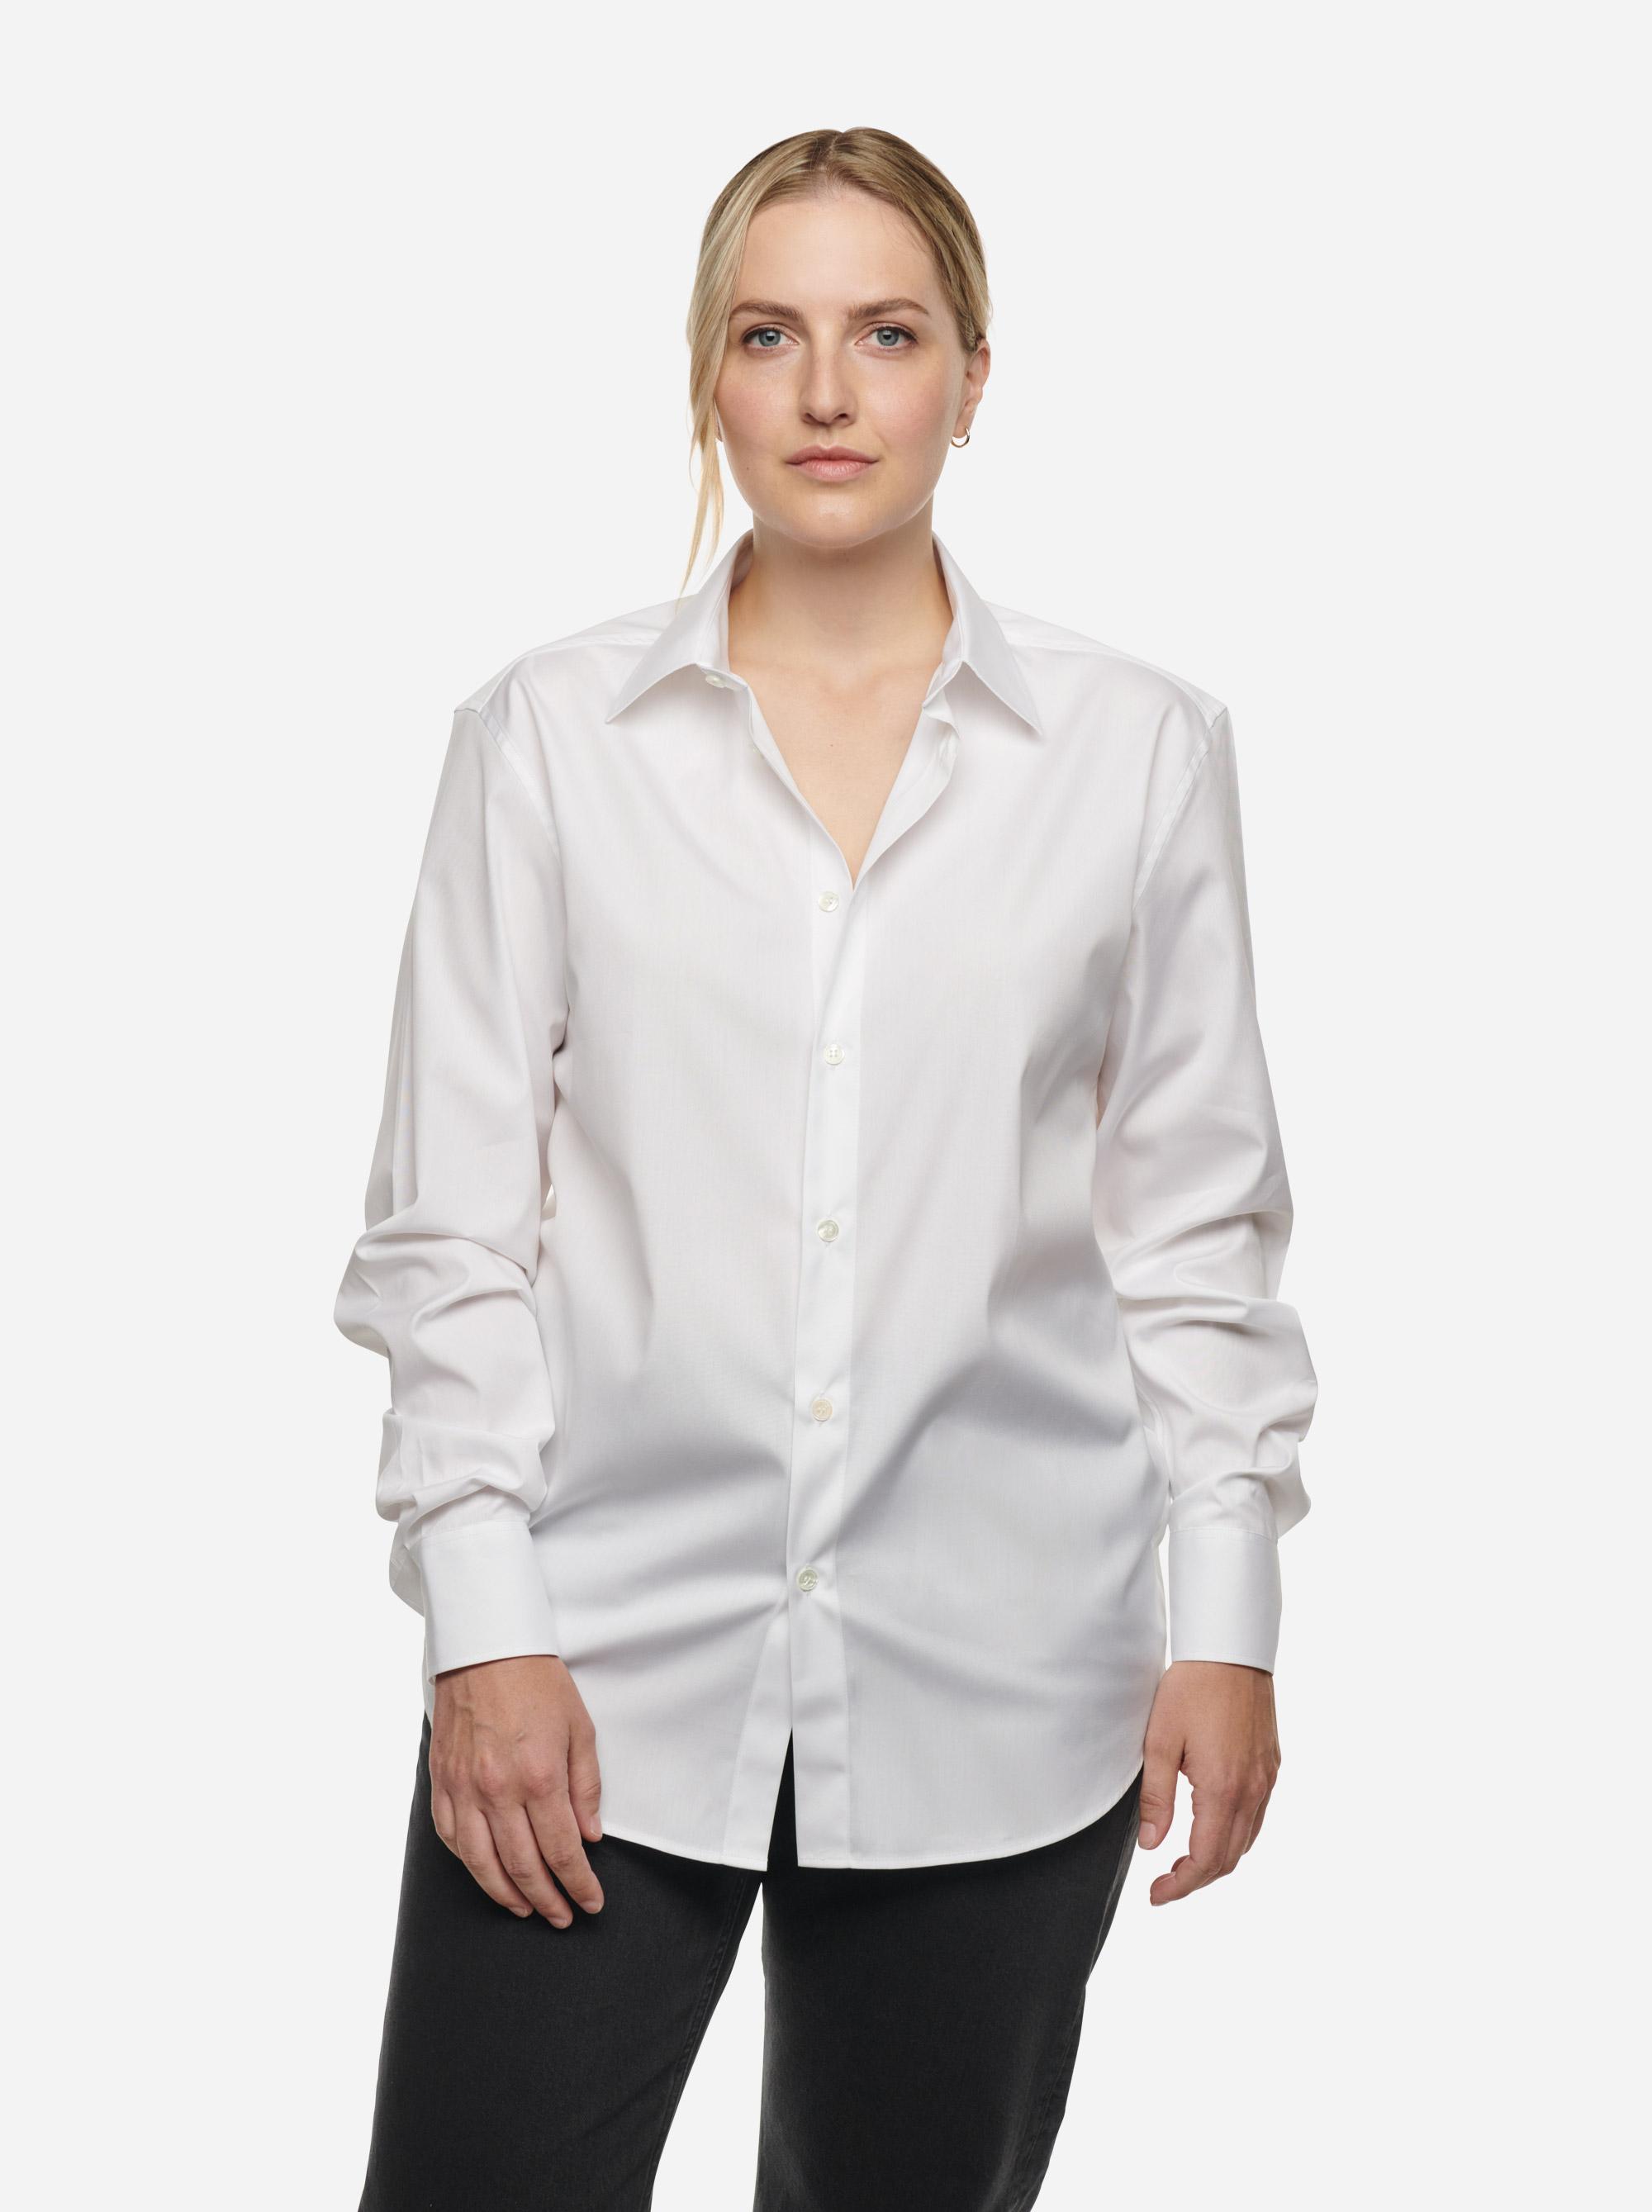 Teym-Shirt-White-women-mens-5